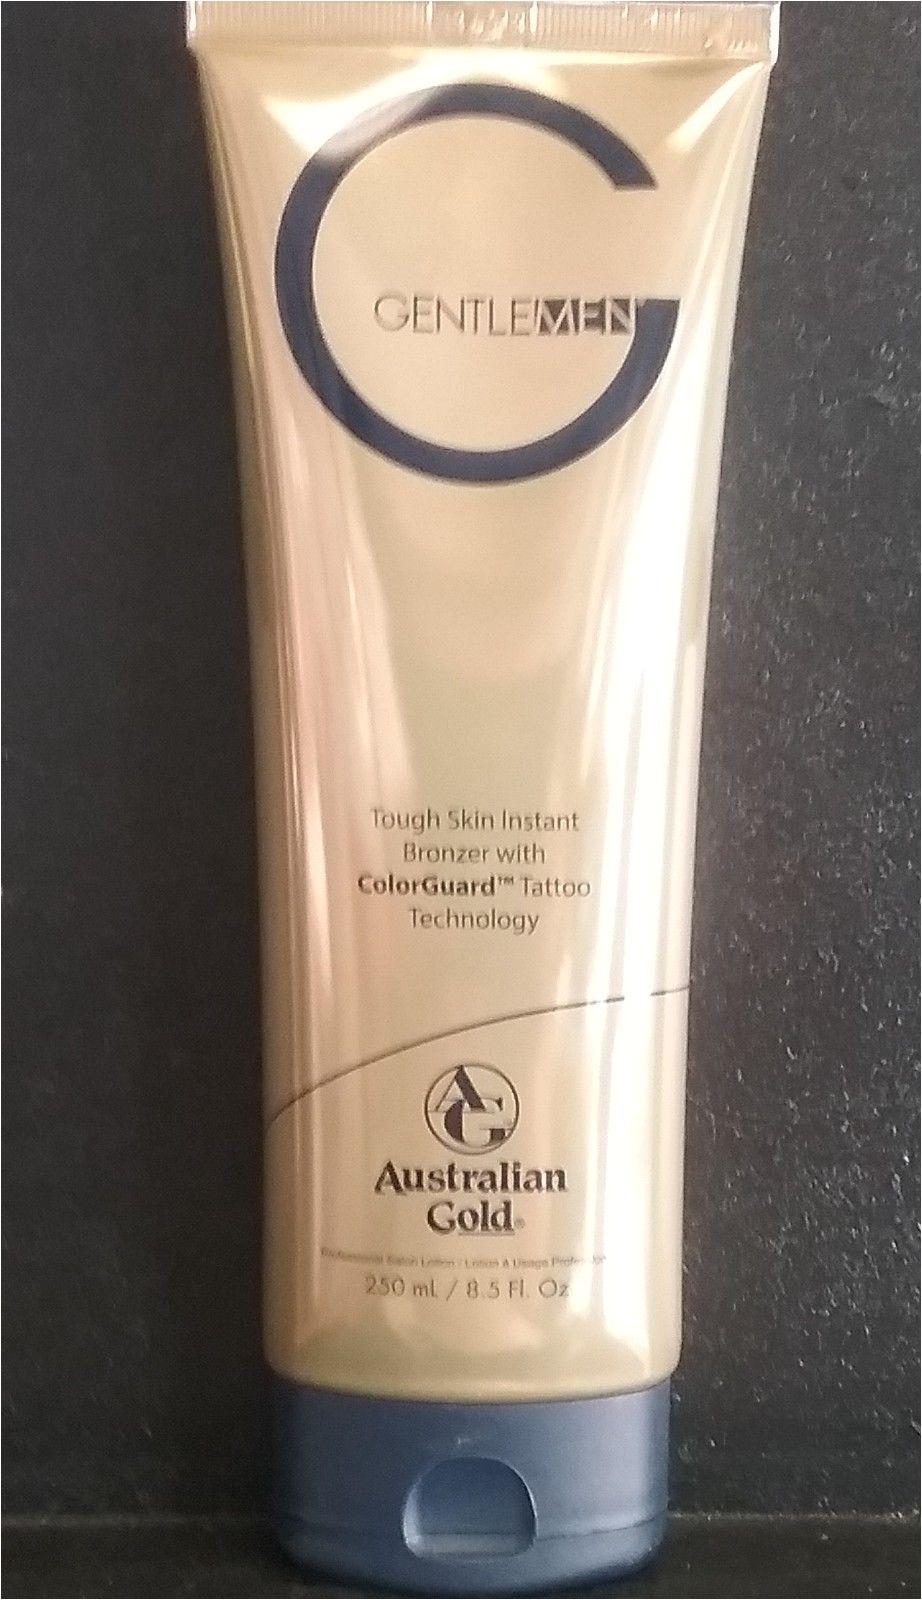 australian gold g gentlemen natural bronzer 8 5 oz fast